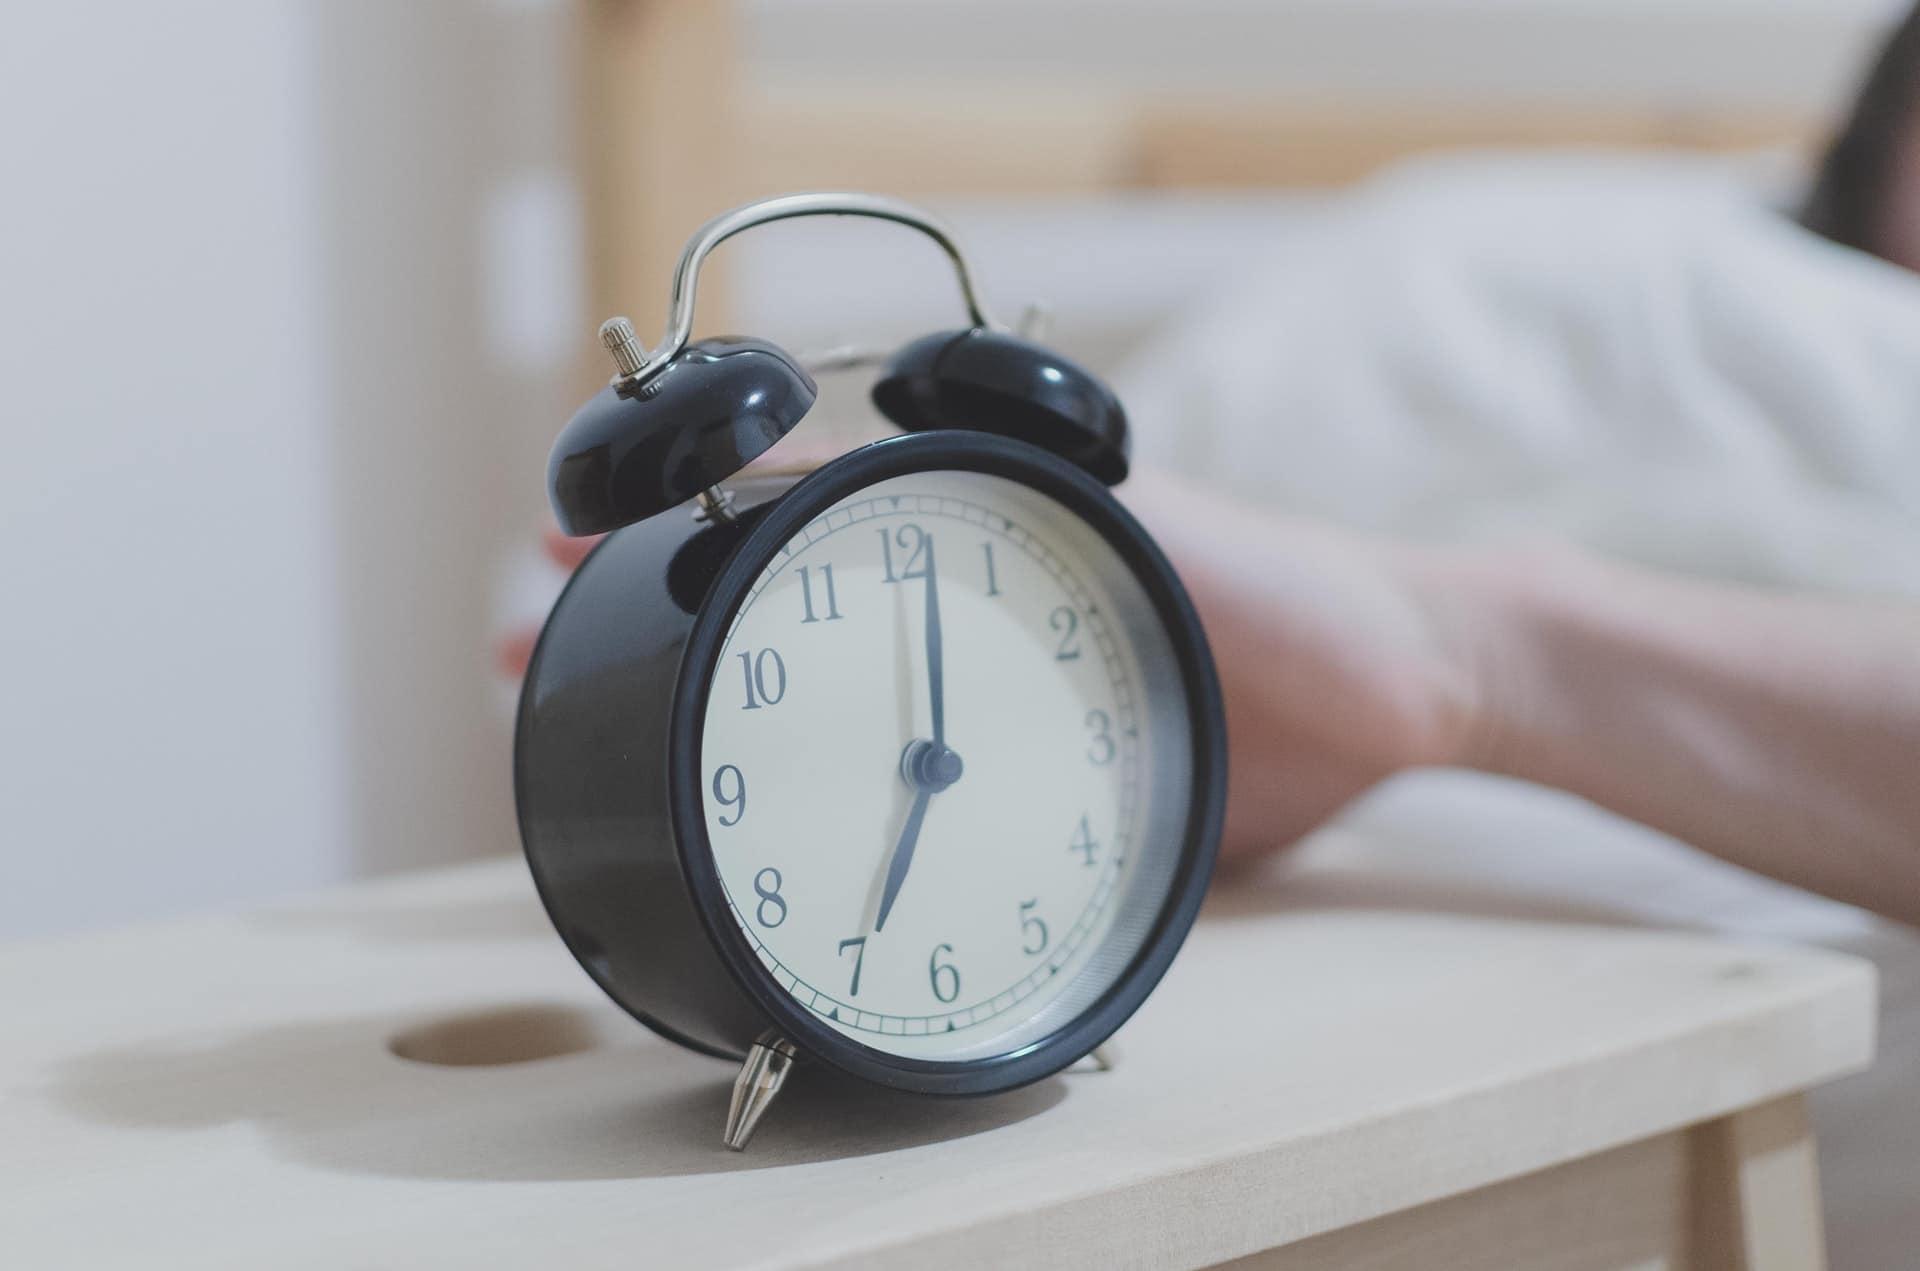 Circadian Rhythm Disorder - Sleep Problems